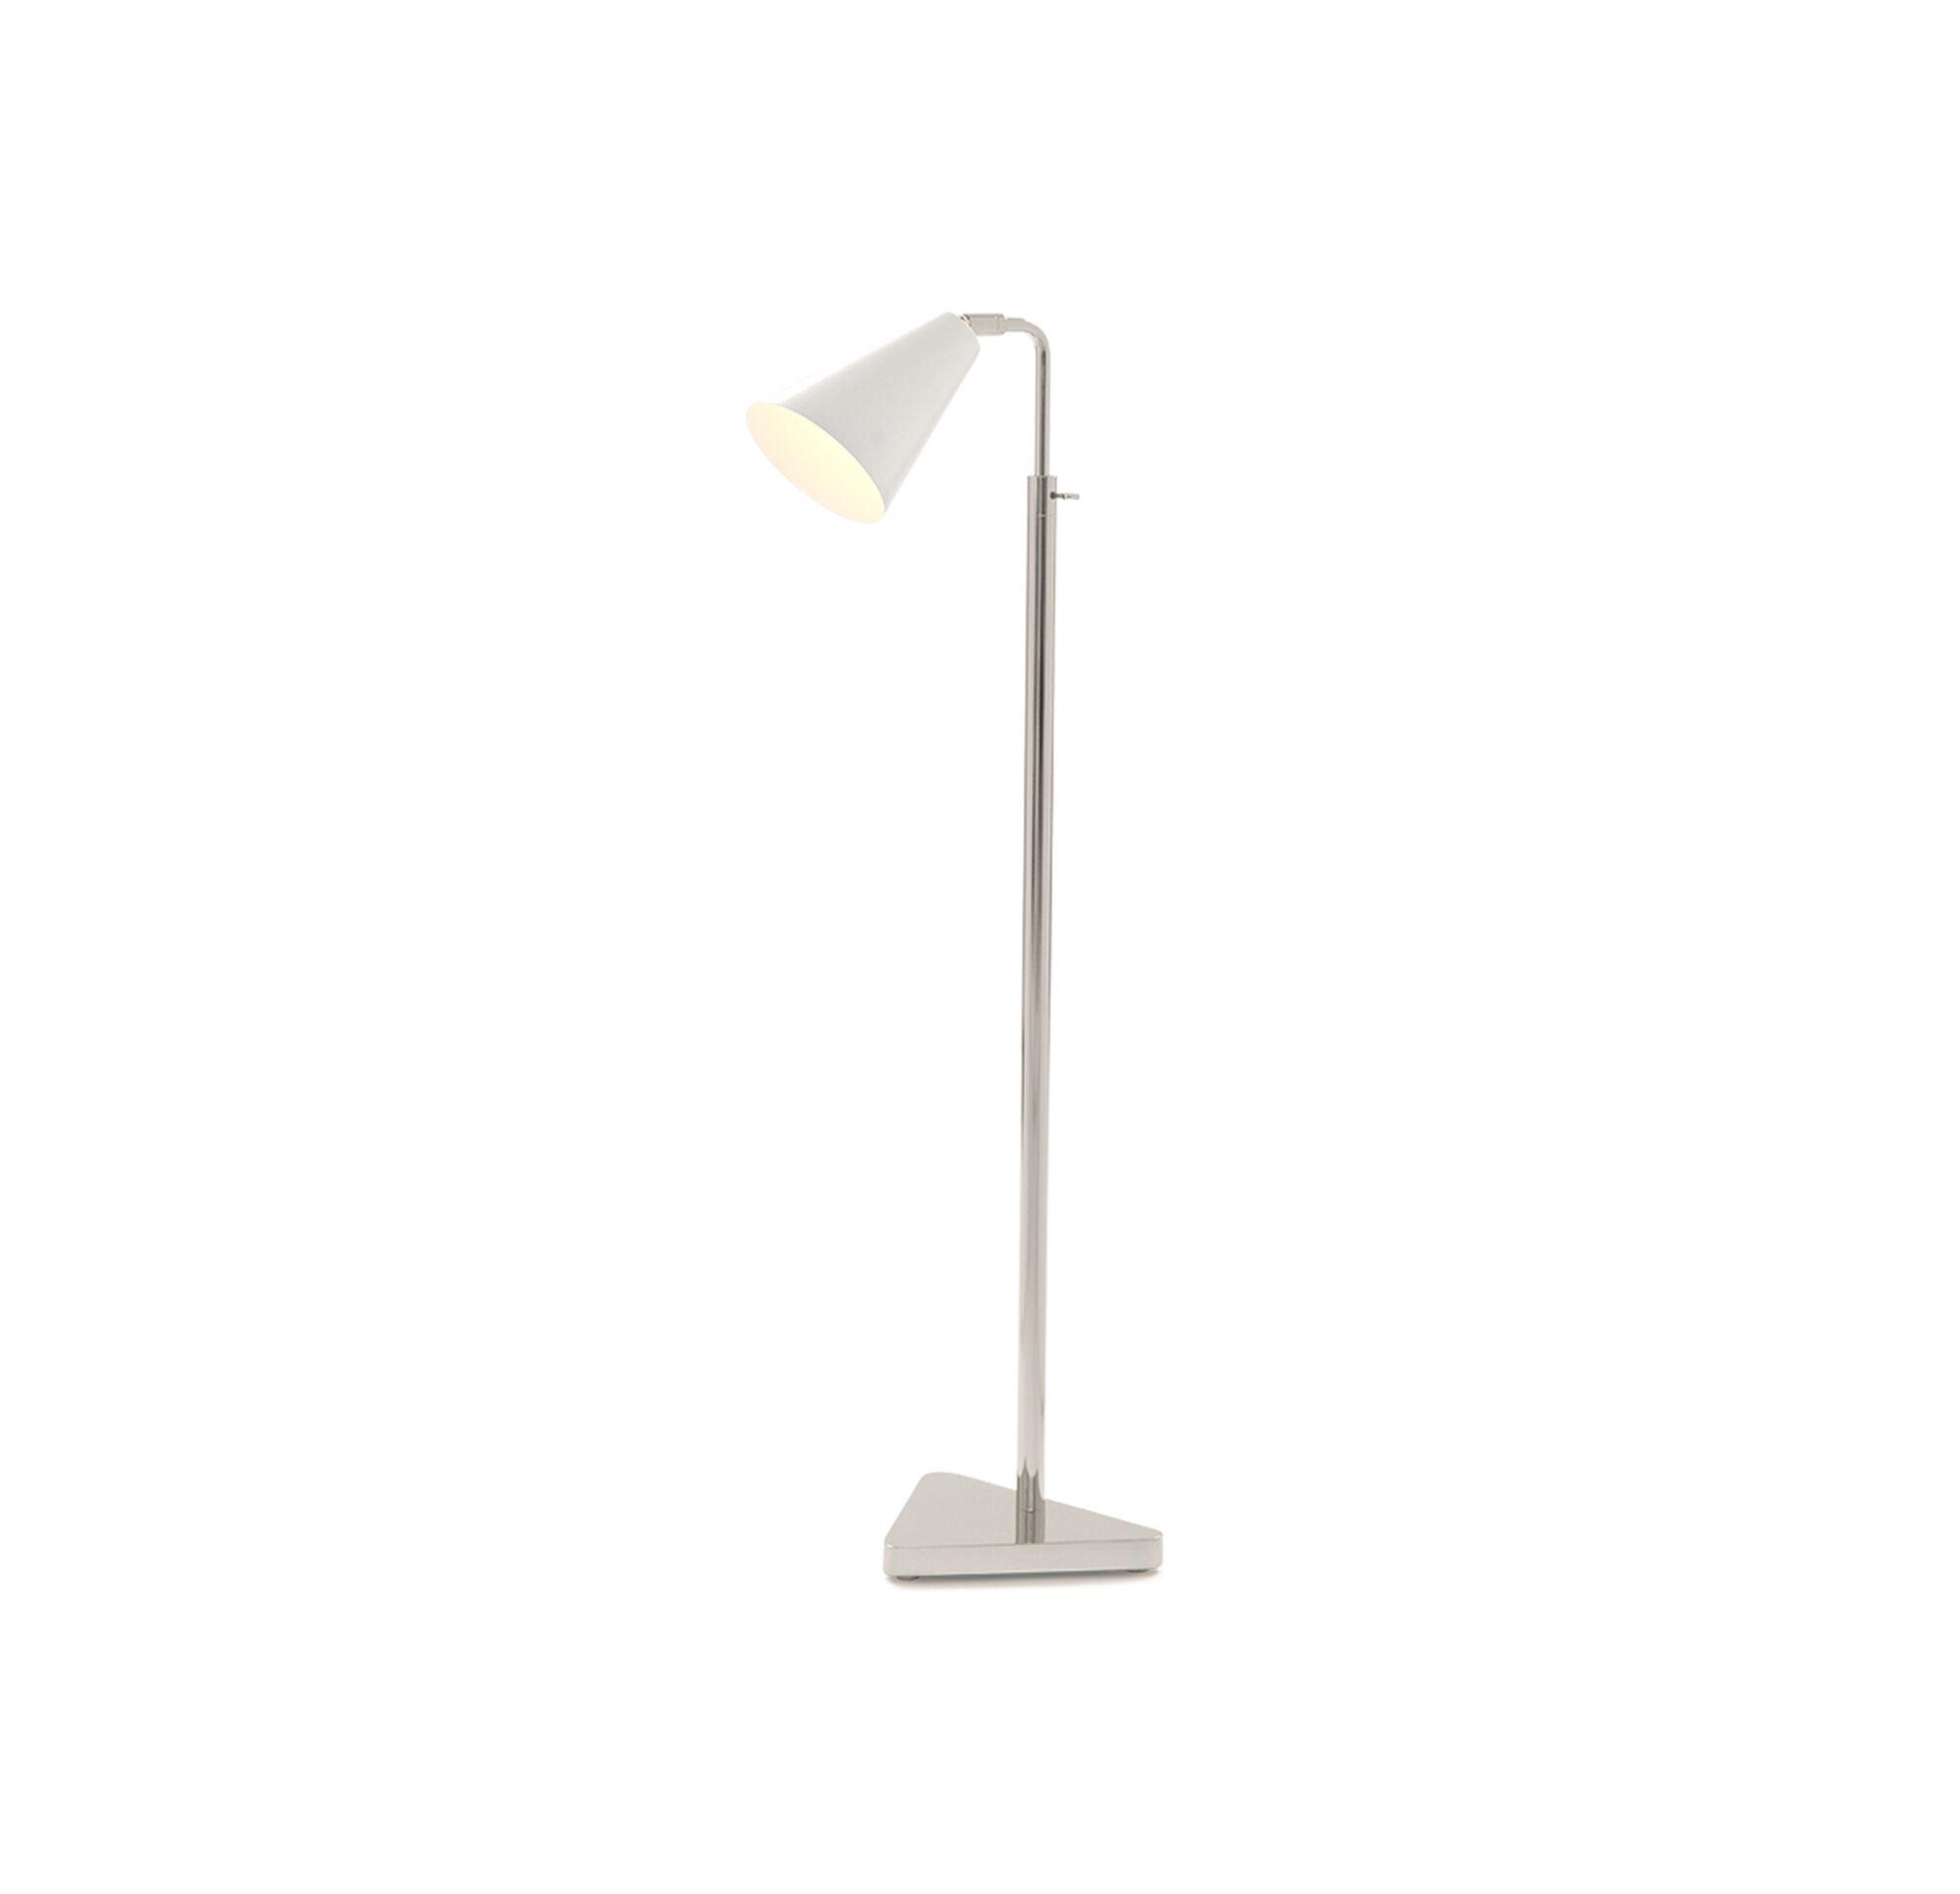 ELLORY FLOOR LAMP - POLISHED NICKEL